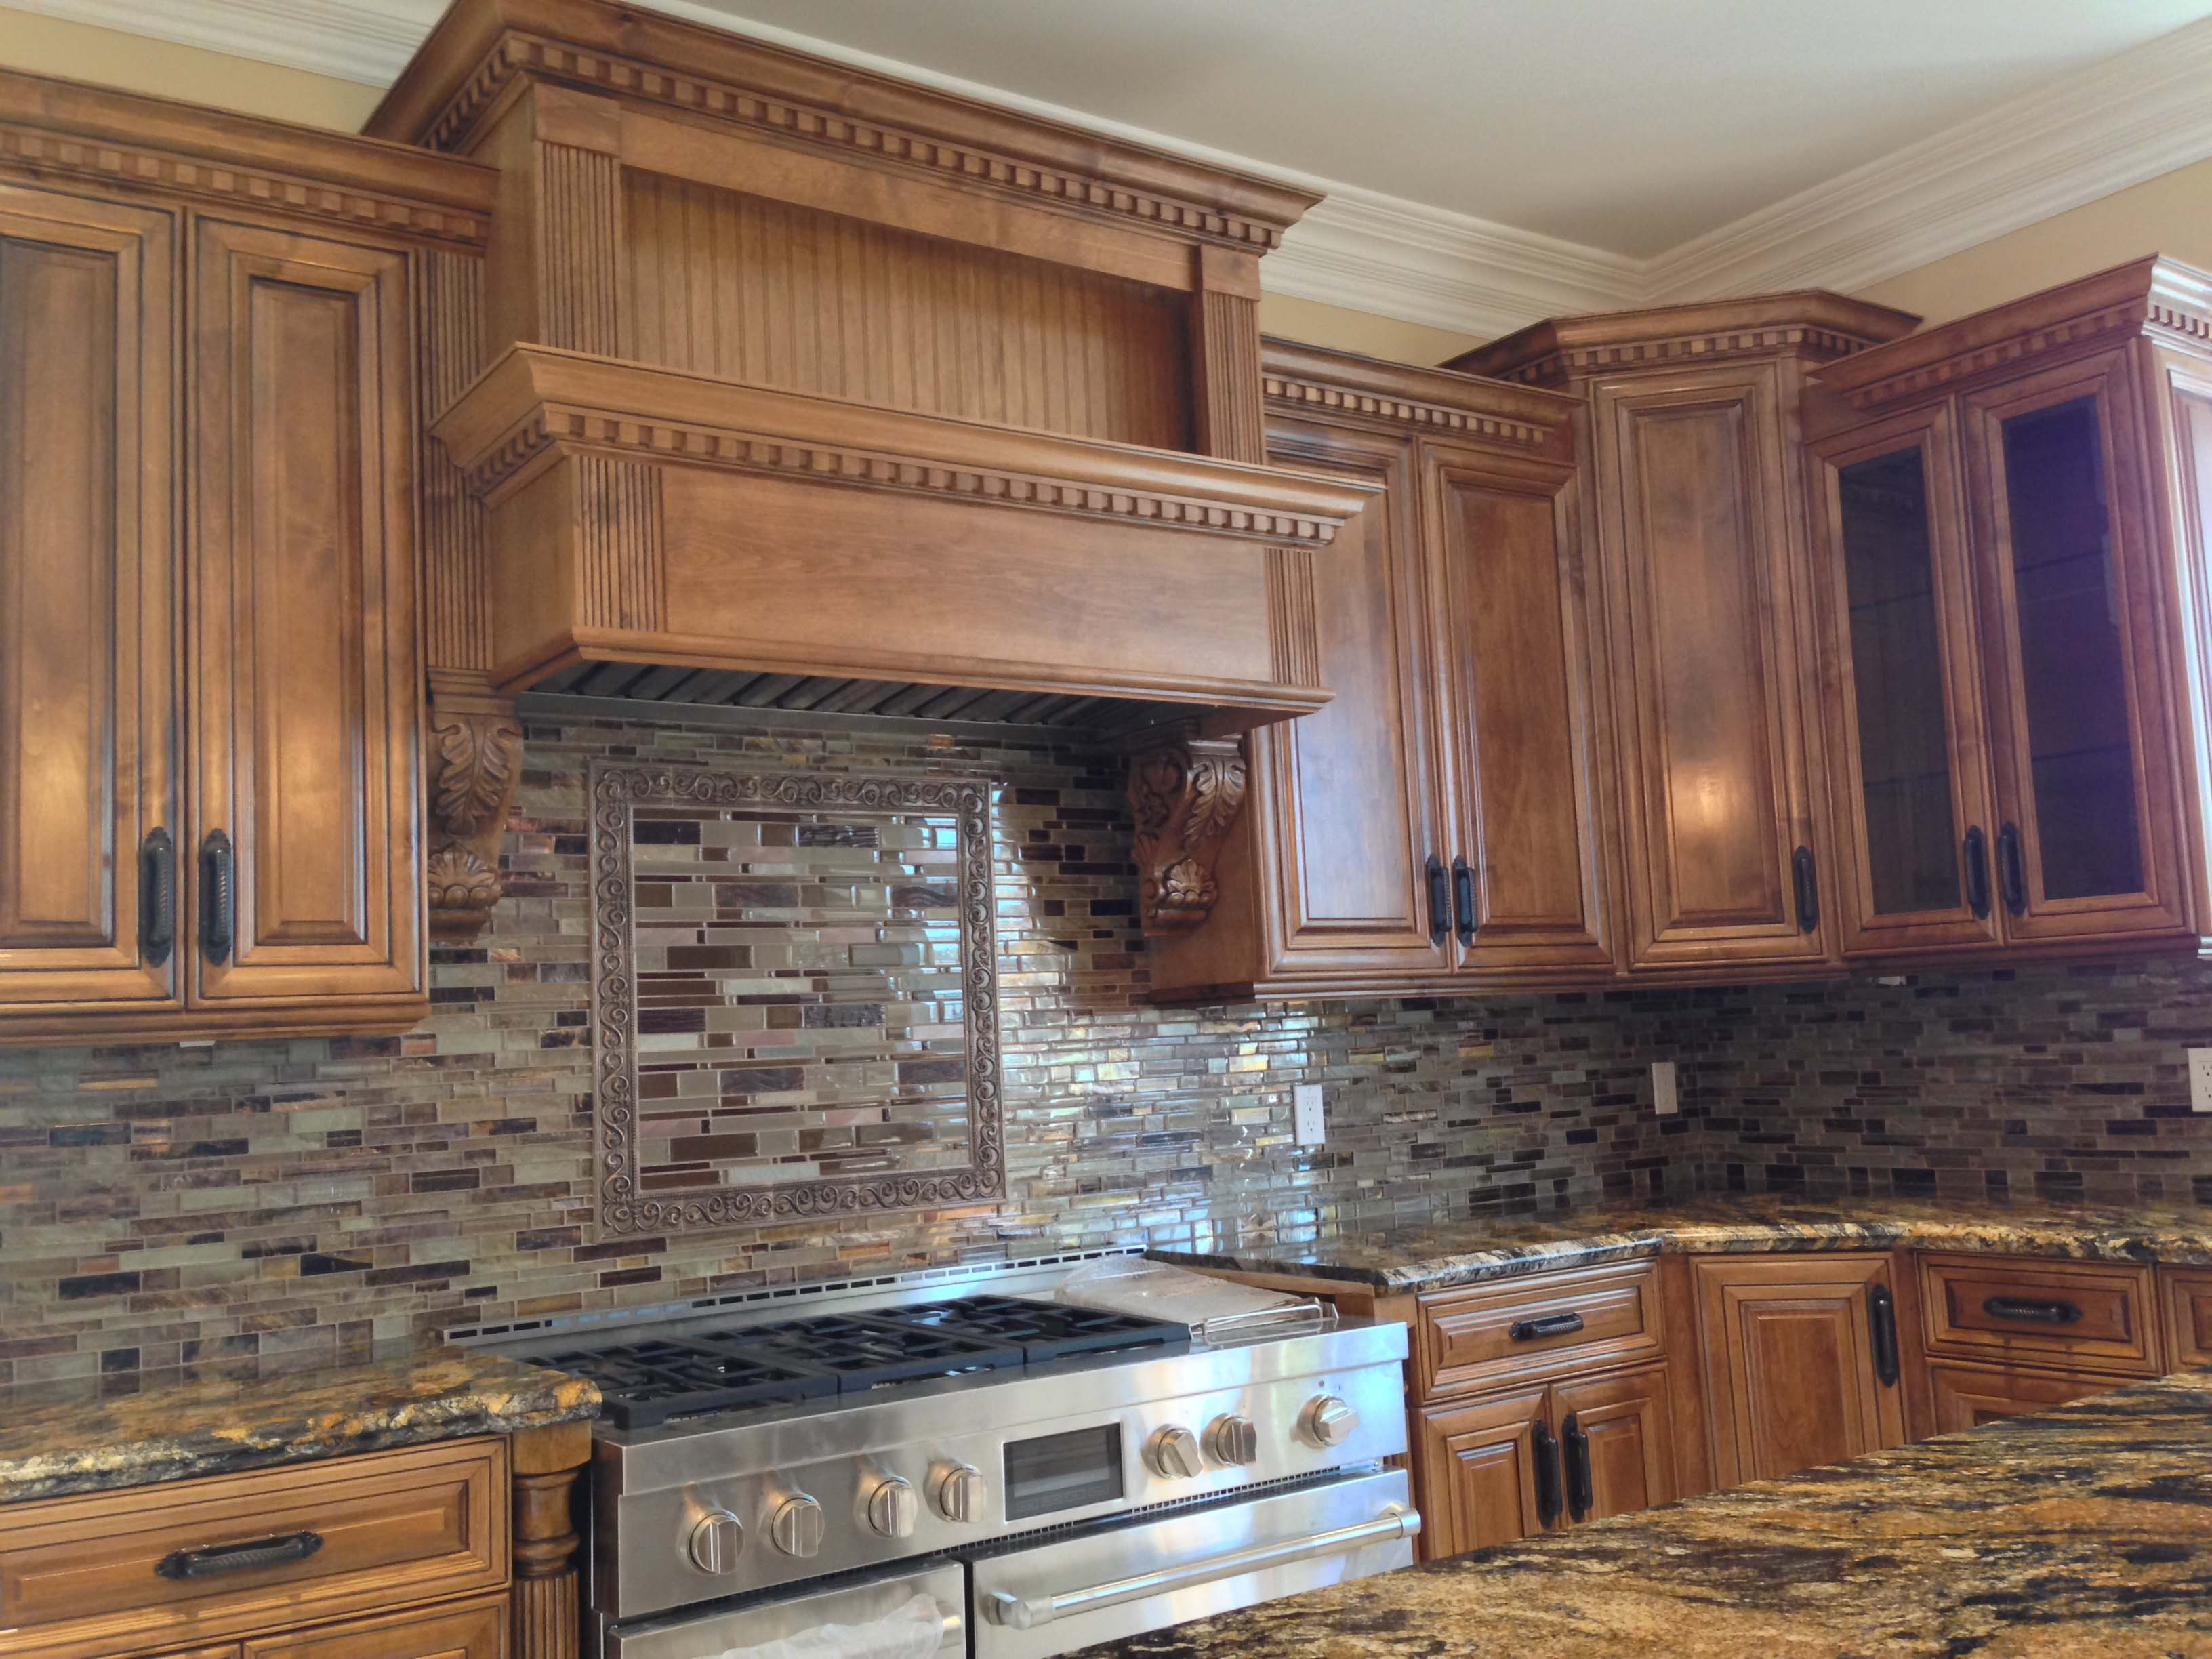 Kitchen & Bath – JMC Development Inc.